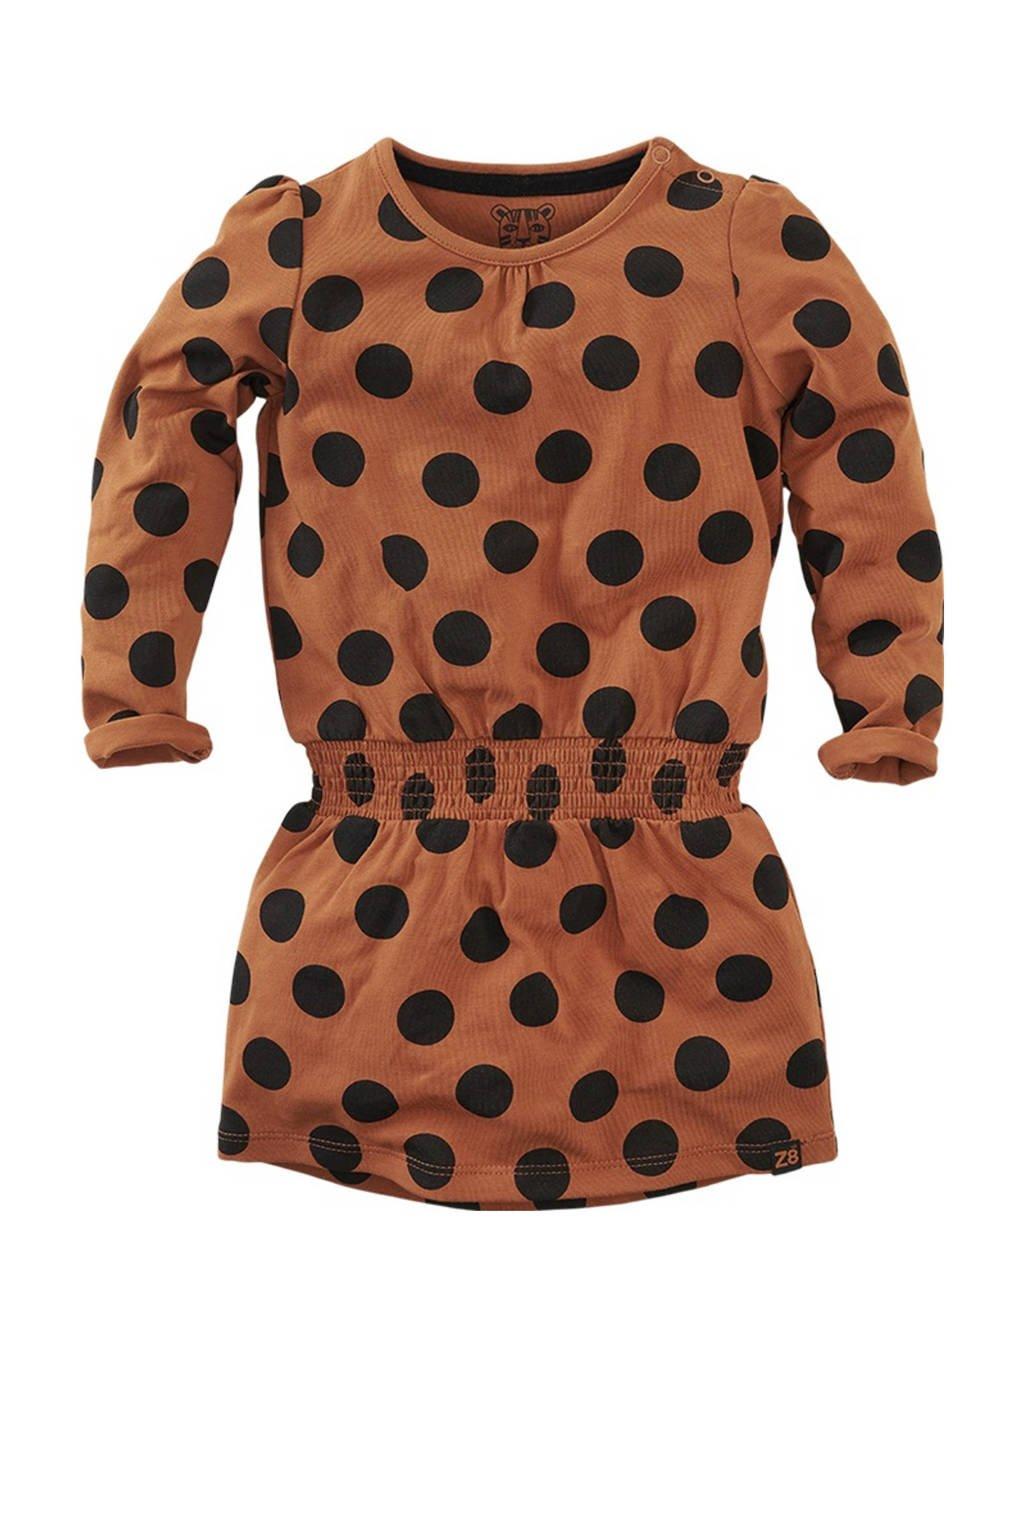 Z8 jurk Caloundra met stippen en plooien roestbruin/zwart, Roestbruin/zwart